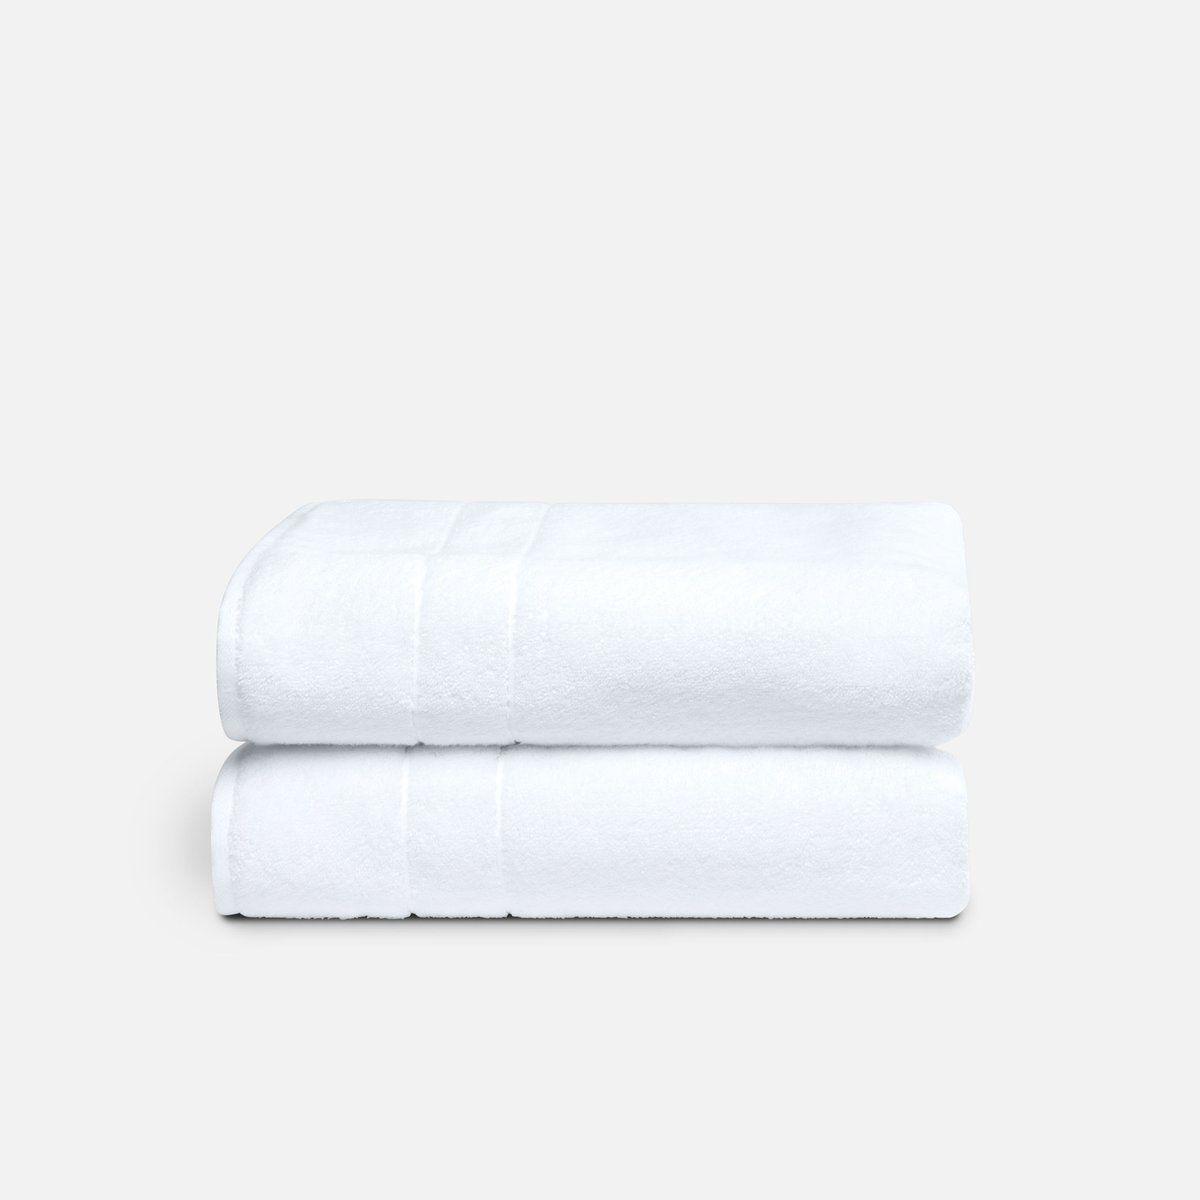 Super Plush Bath Towels Plush Bath Towel Plush Towel Towel